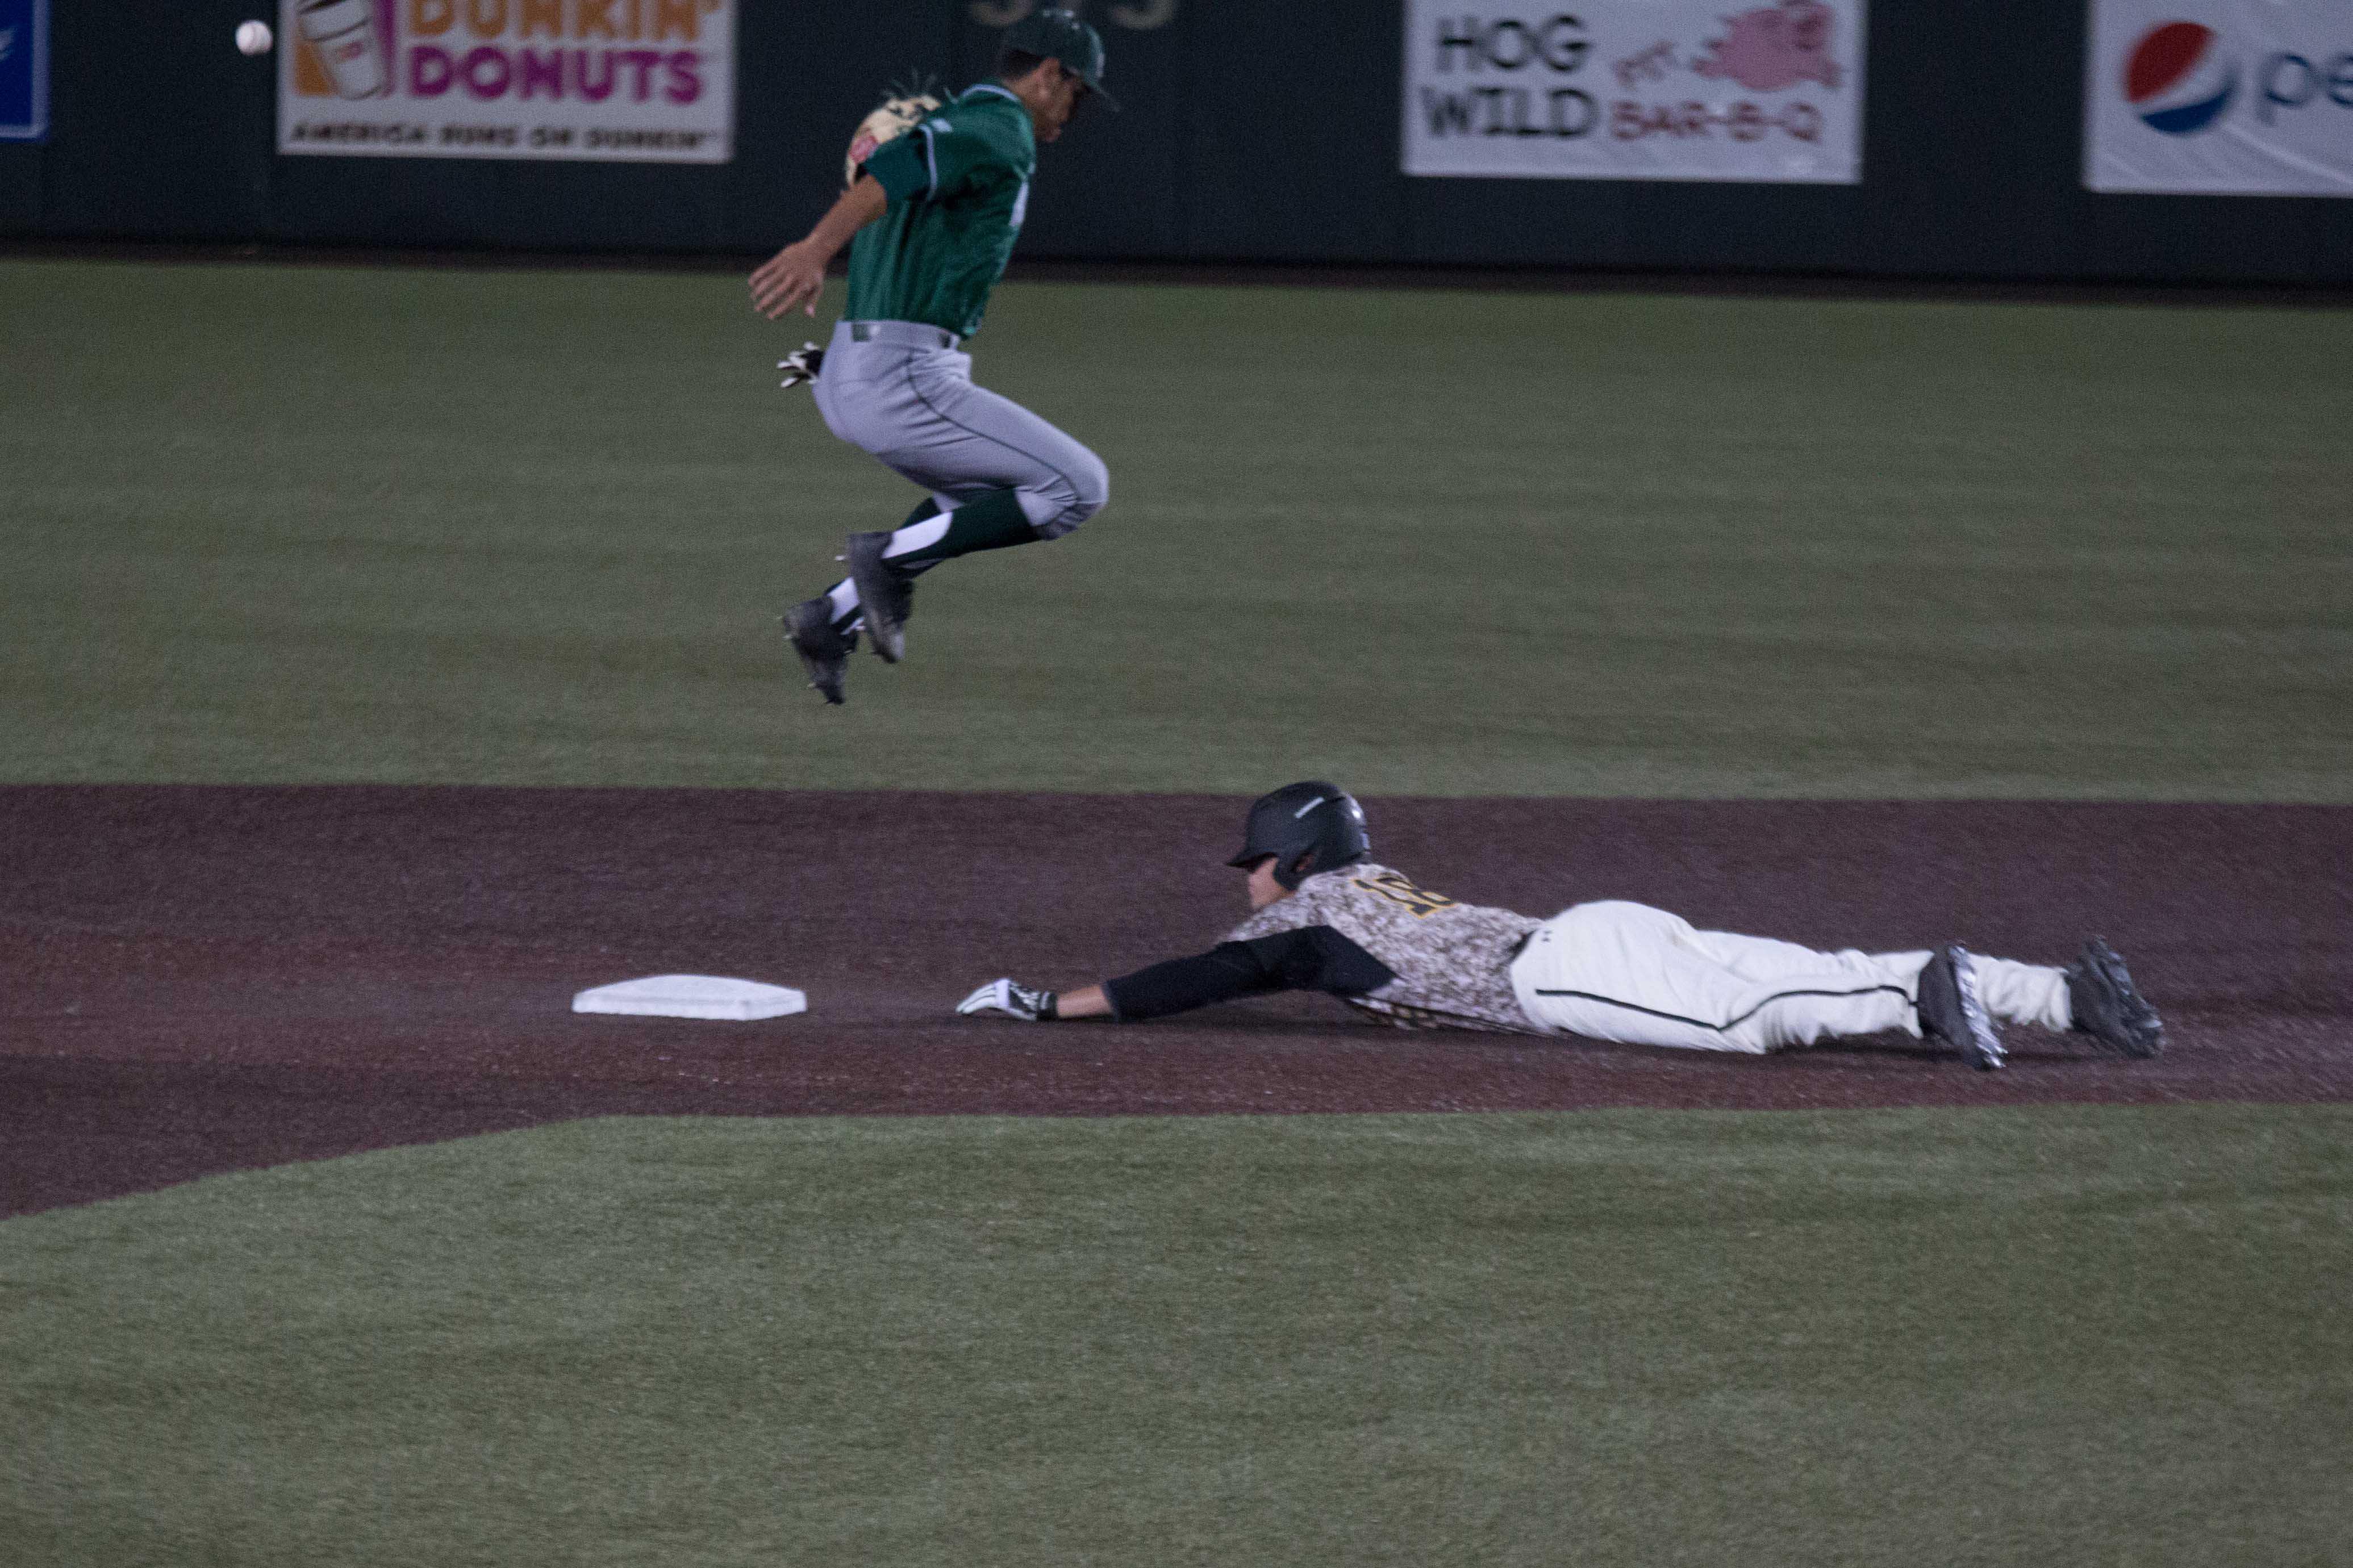 Sophomore Alec Bohm steals second base during the game against Sacramento.